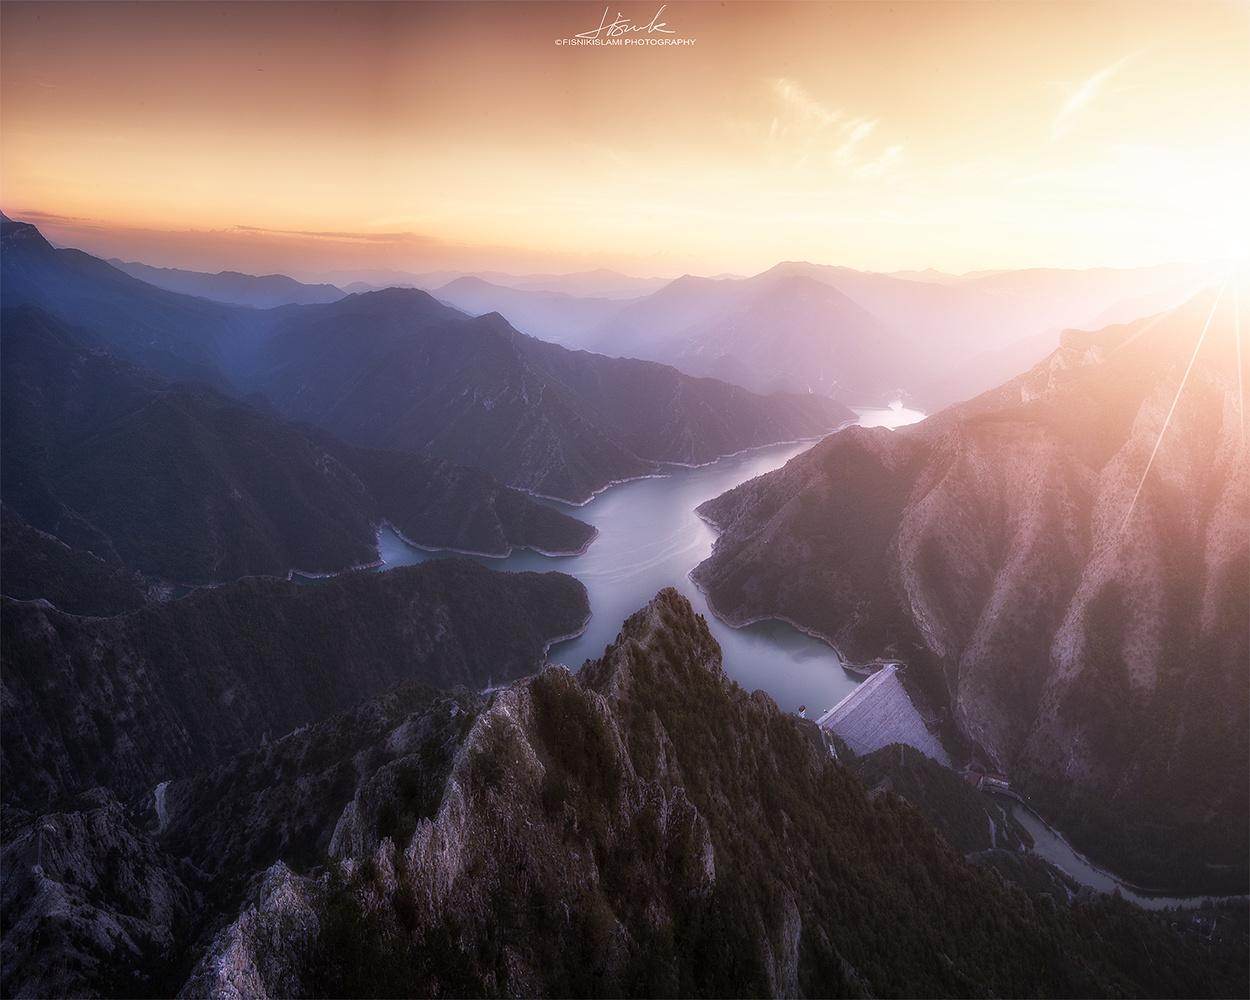 Borderless view by Fisnik Islami